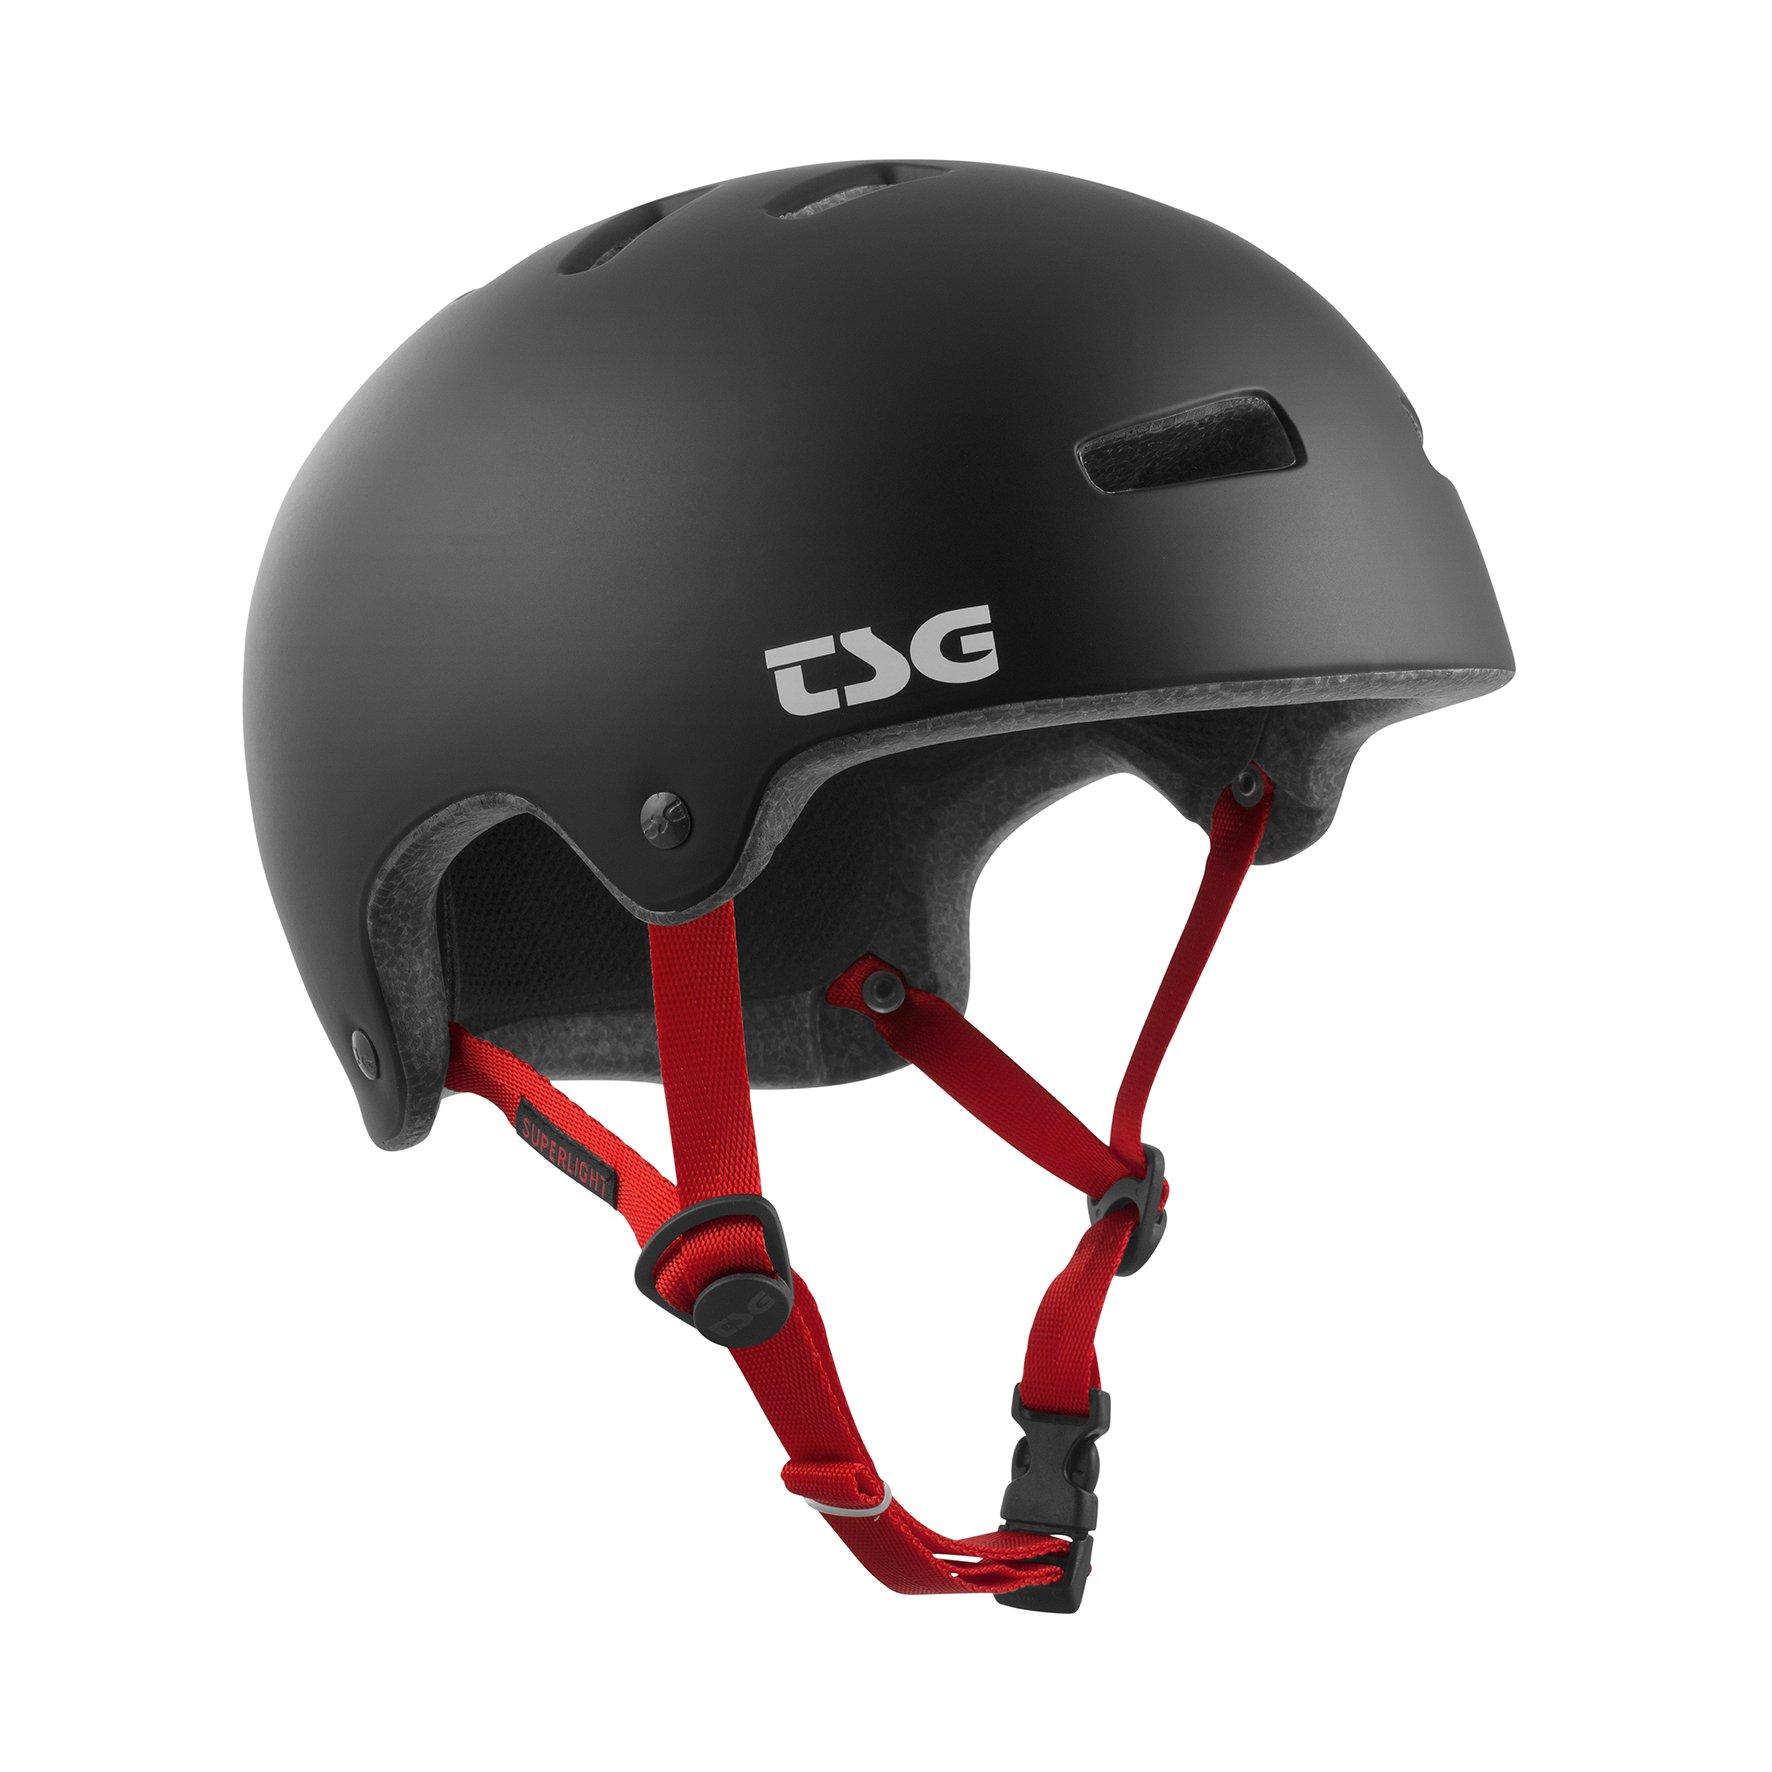 TSG Superlight Solid Color - (satin black,S/M 54-56 cm) Helmet for Bicycle Skateboard